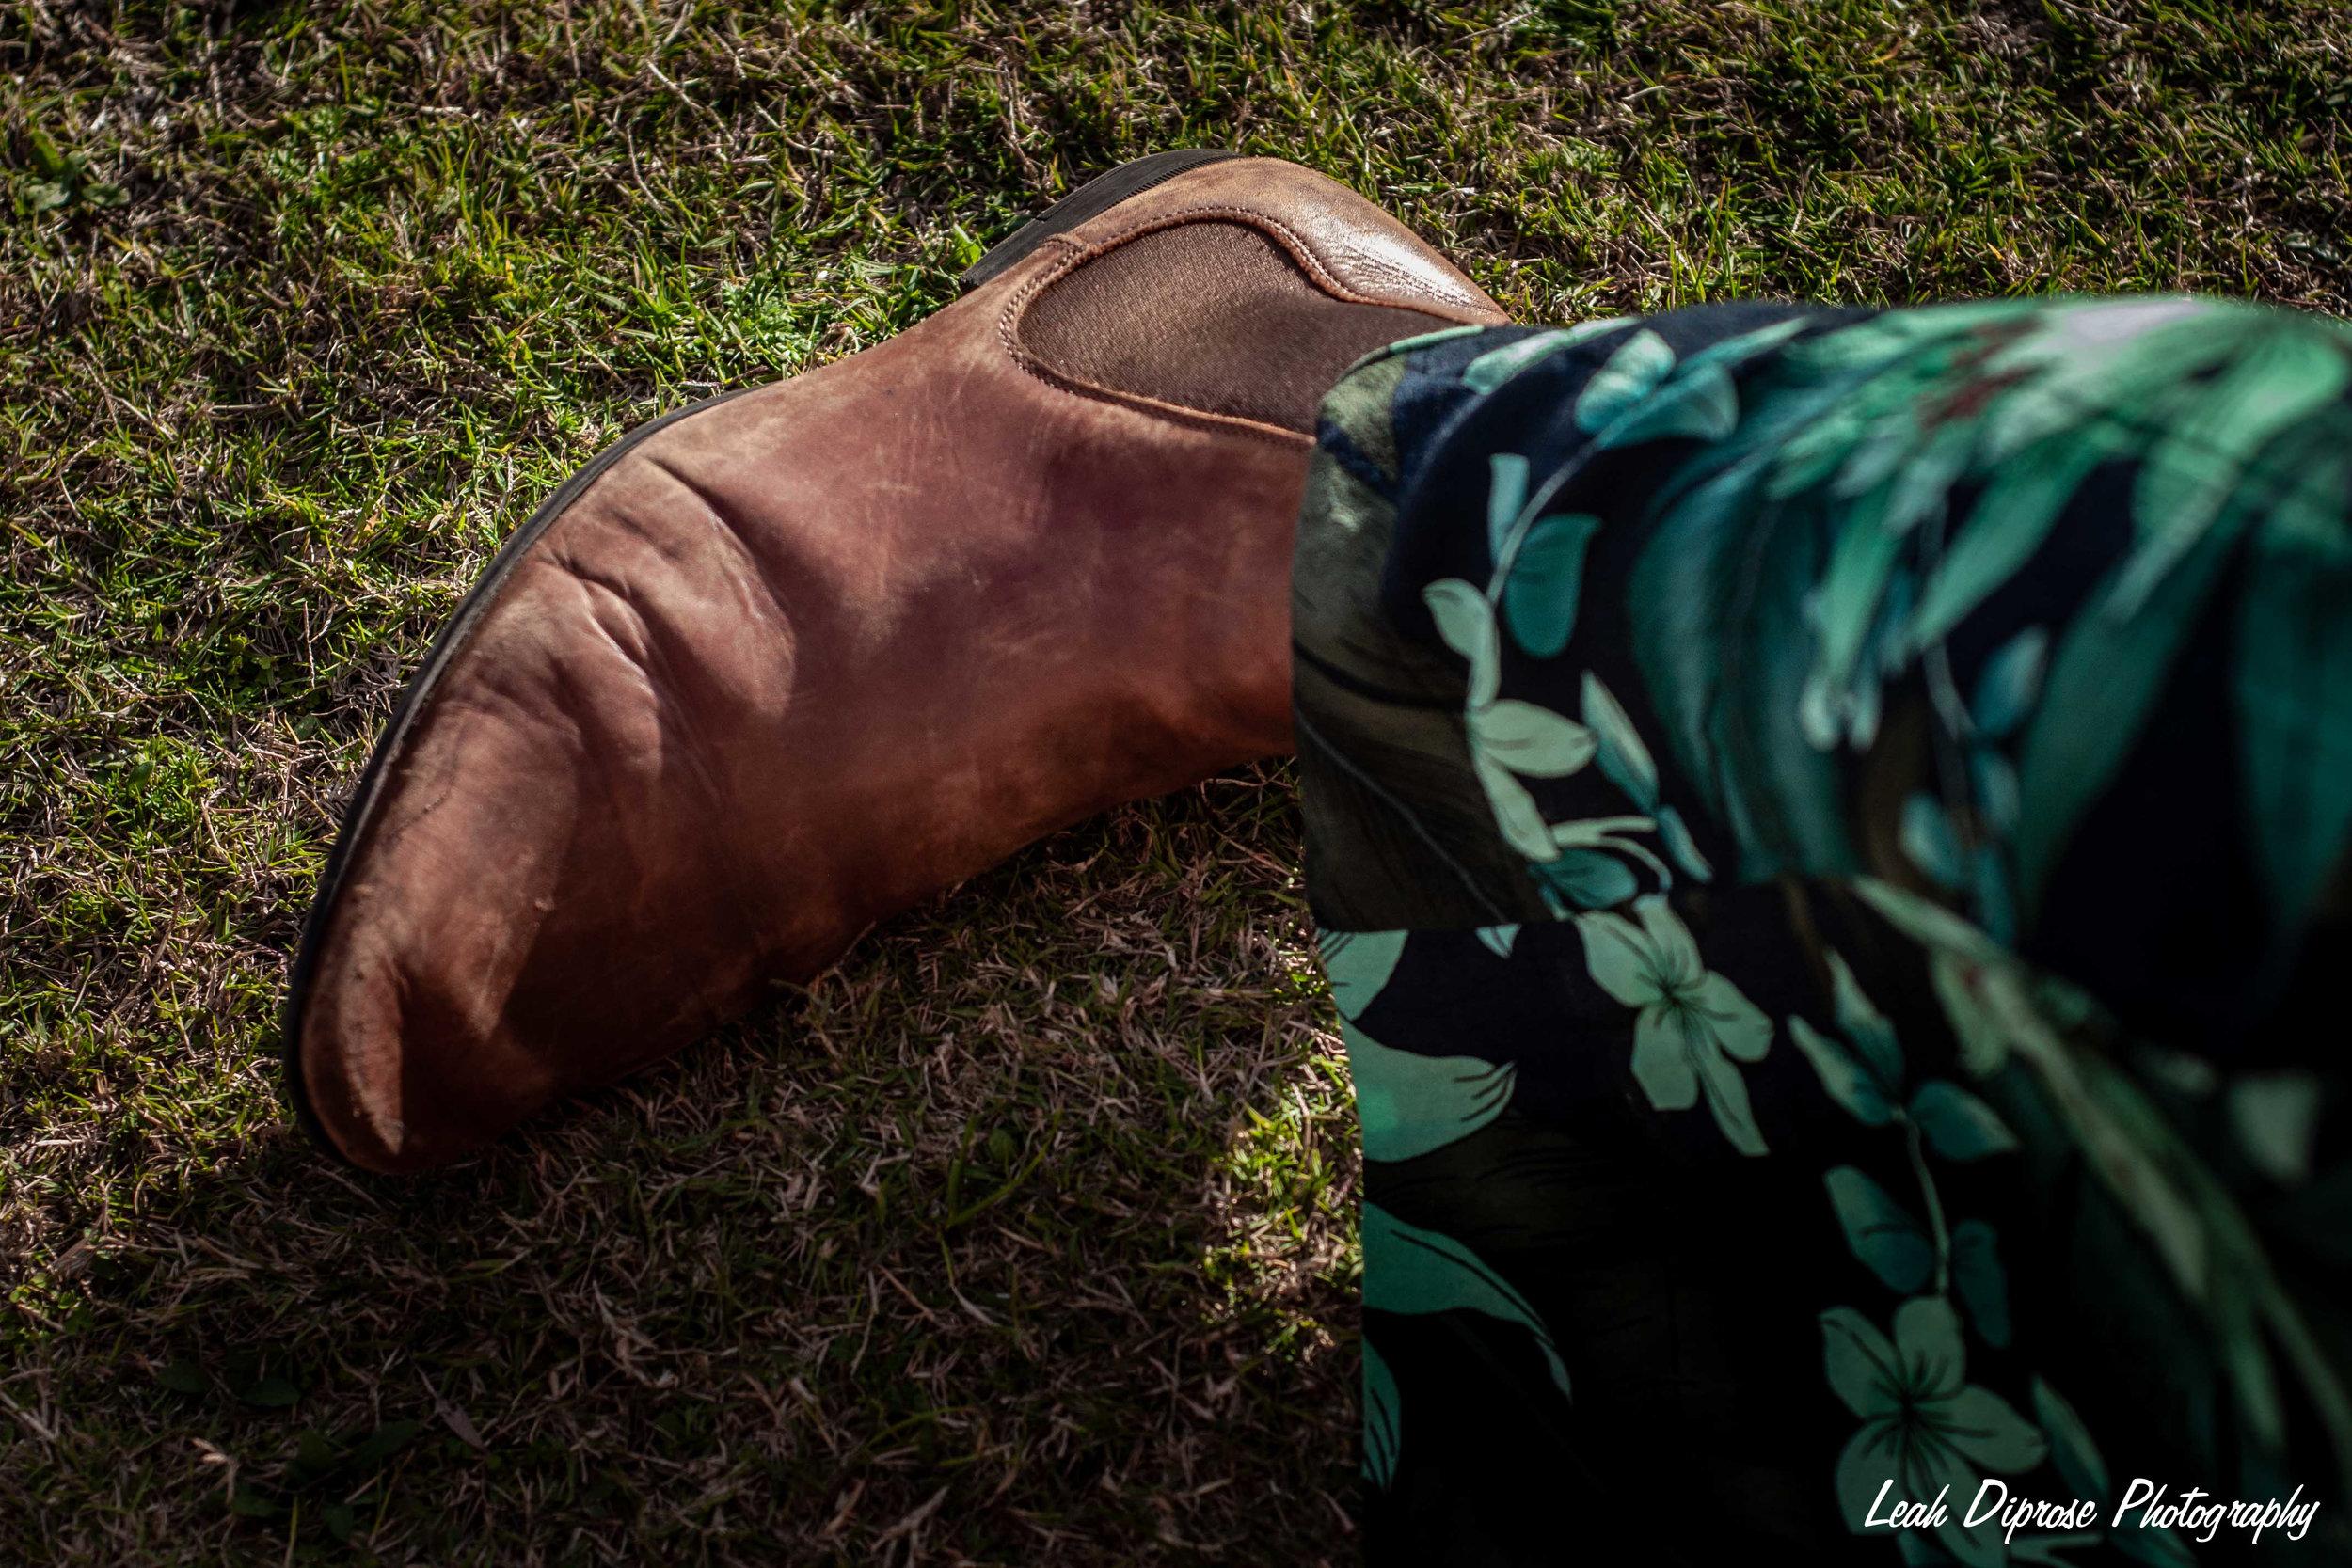 Leah Diprose Photography image-9799.jpg